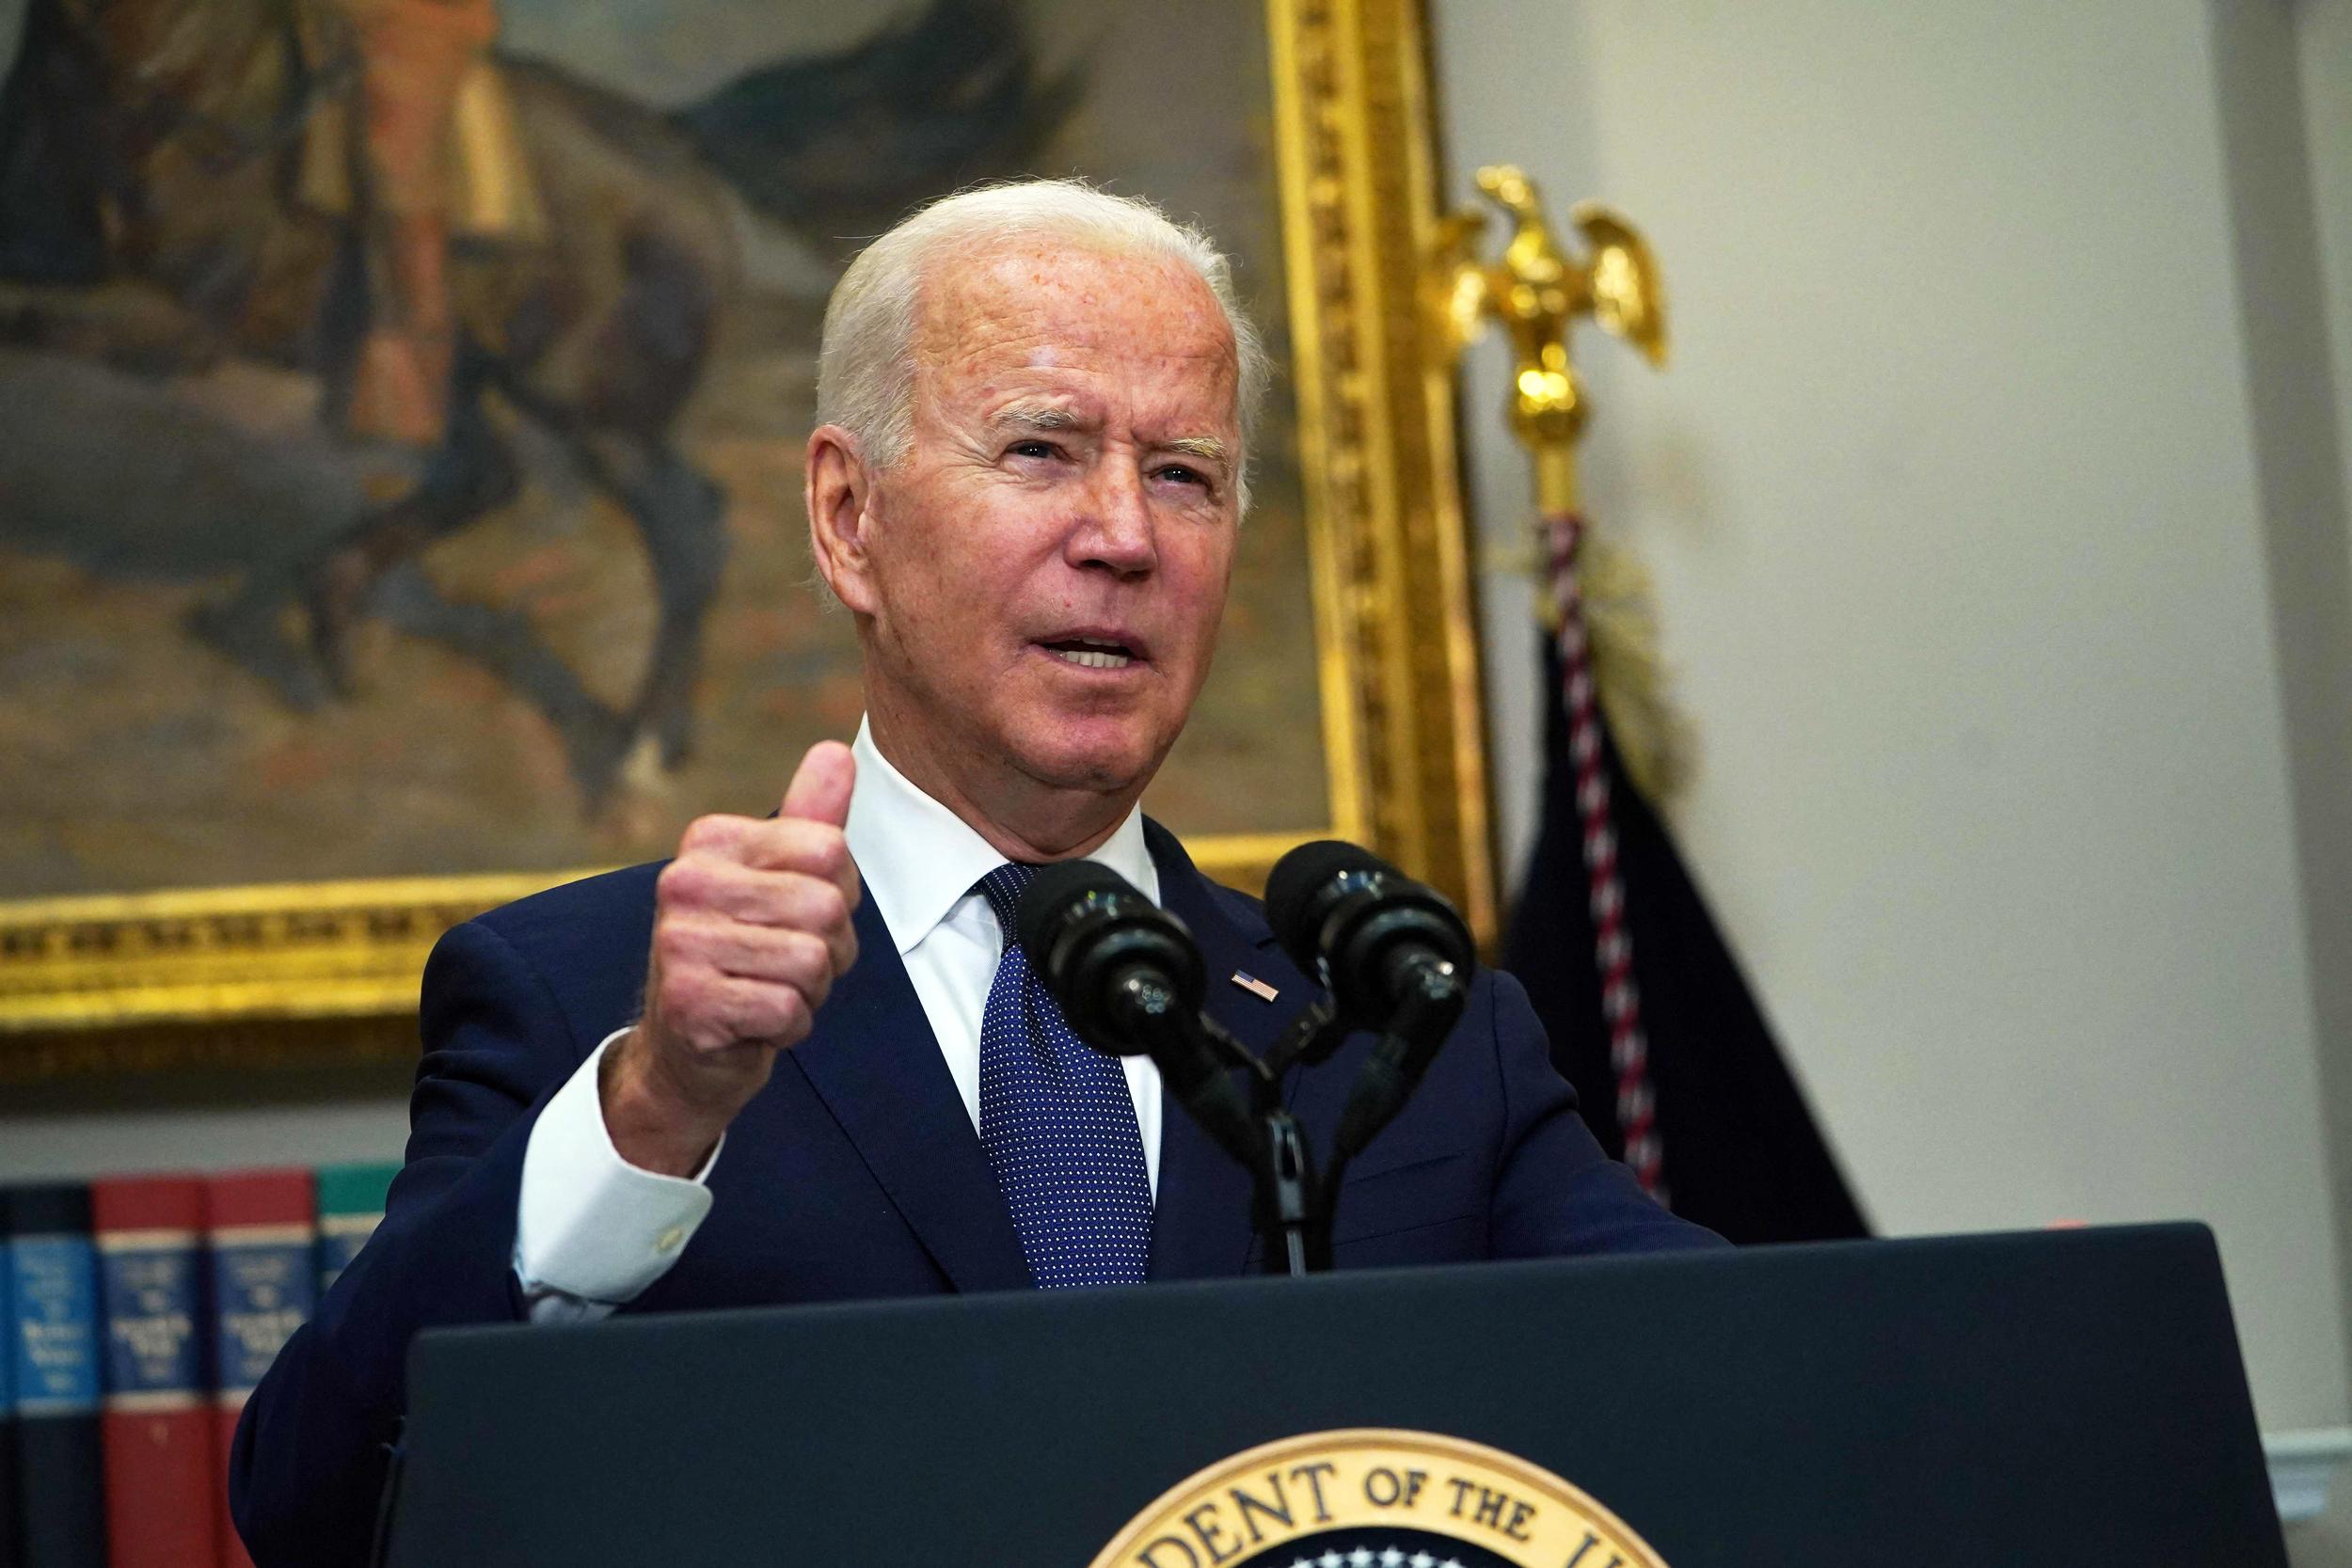 Biden says U.S. may extend Afghanistan withdrawal deadline as evacuations continue